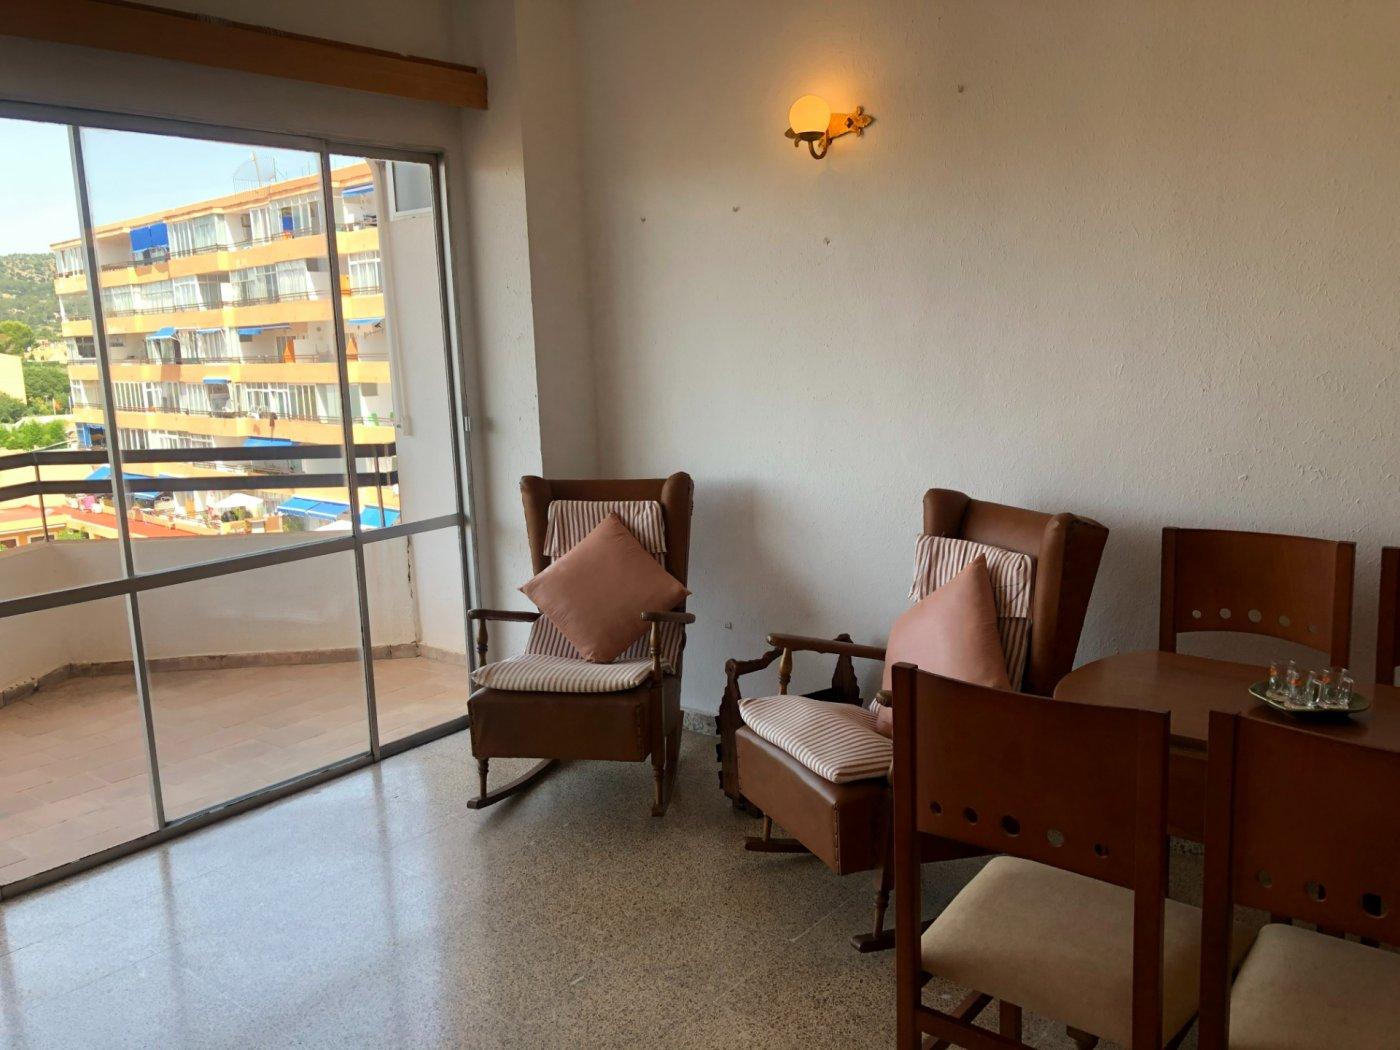 Maravilloso alquiler apartamento en son caliu!!!!! - imagenInmueble5